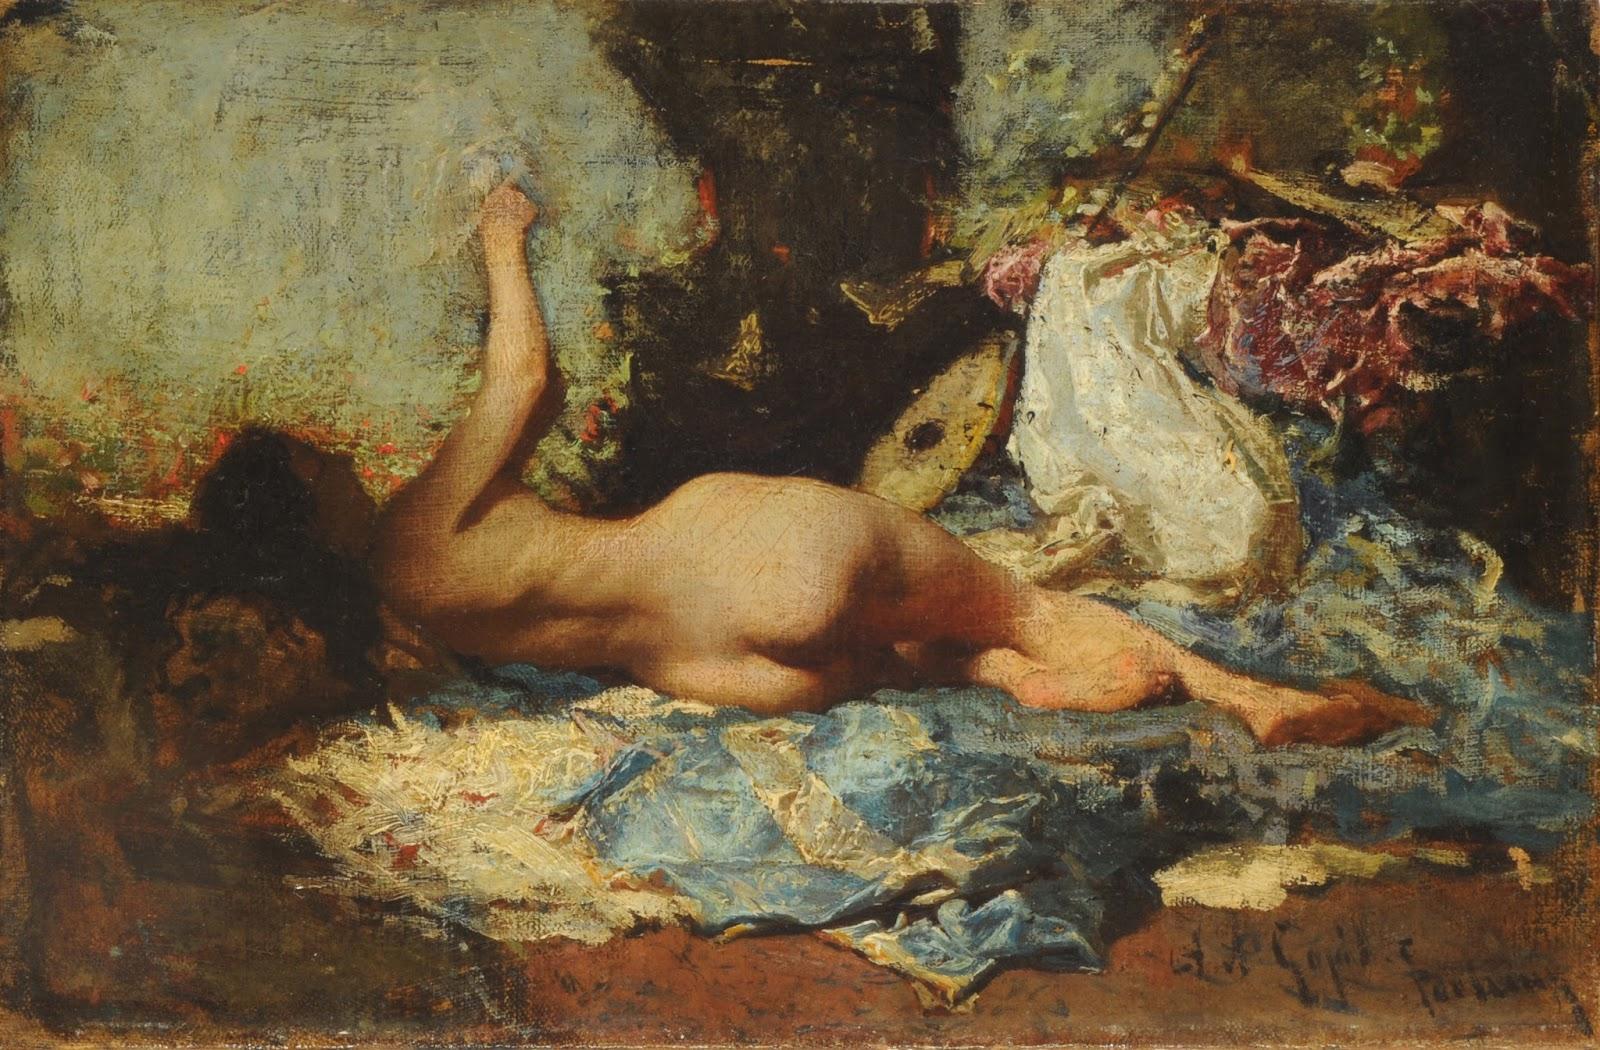 MARIANO FORTUNY Y MARSAL - Odalisca - Óleo sobre tela - 21 x 32,5 - 1865 - Museu Nacional de Belas Artes da Argentina.jpg